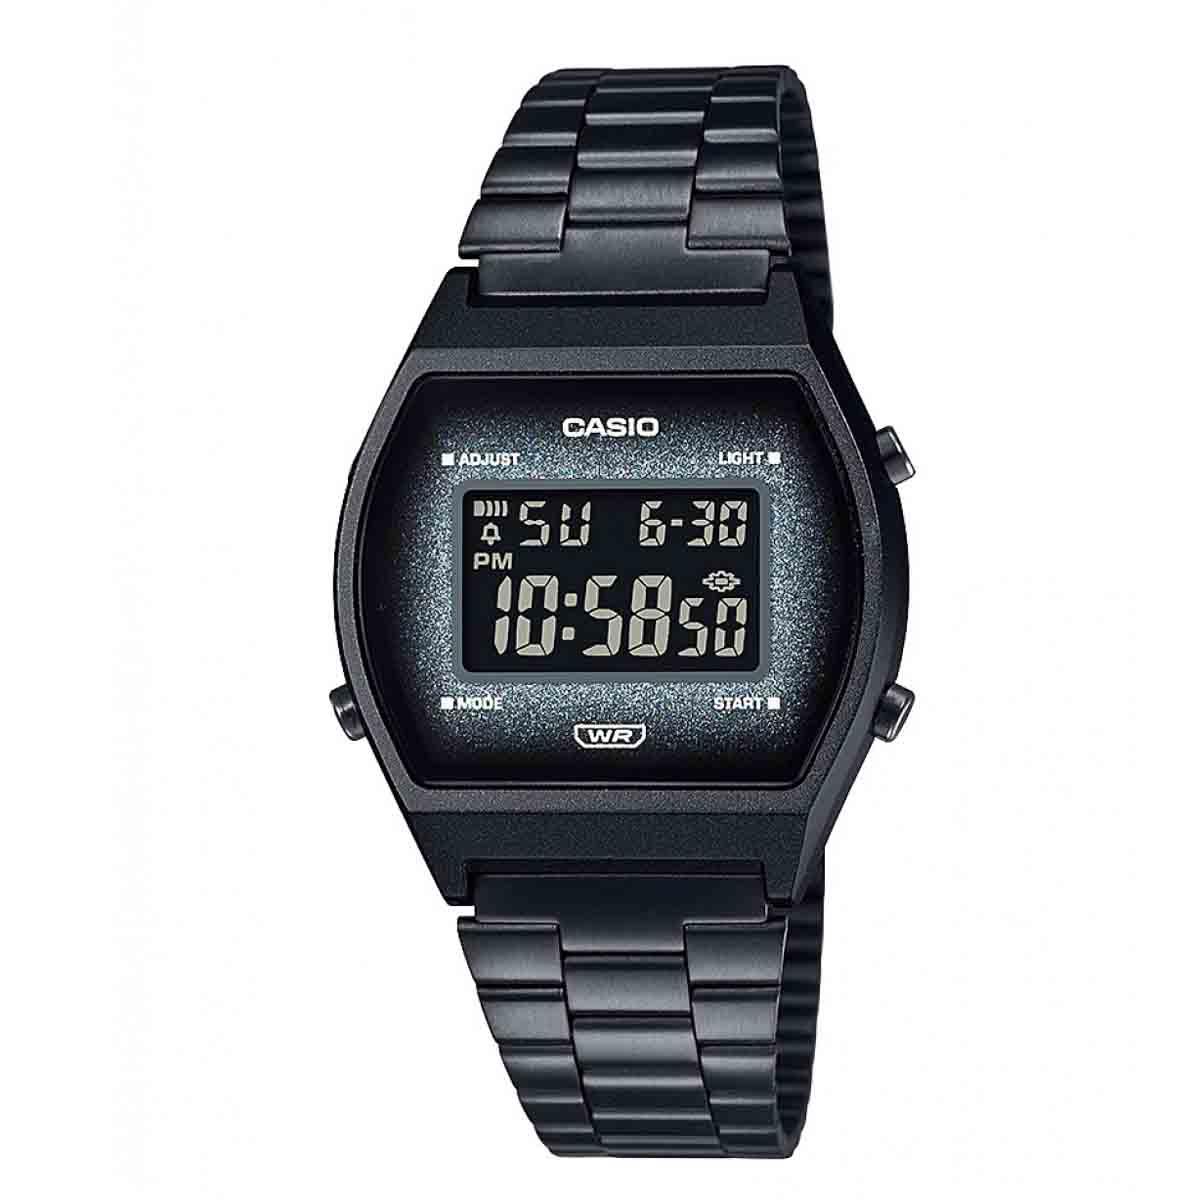 Relógio Casio Vintage Preto Feminino Digital B640WBG-1BDF